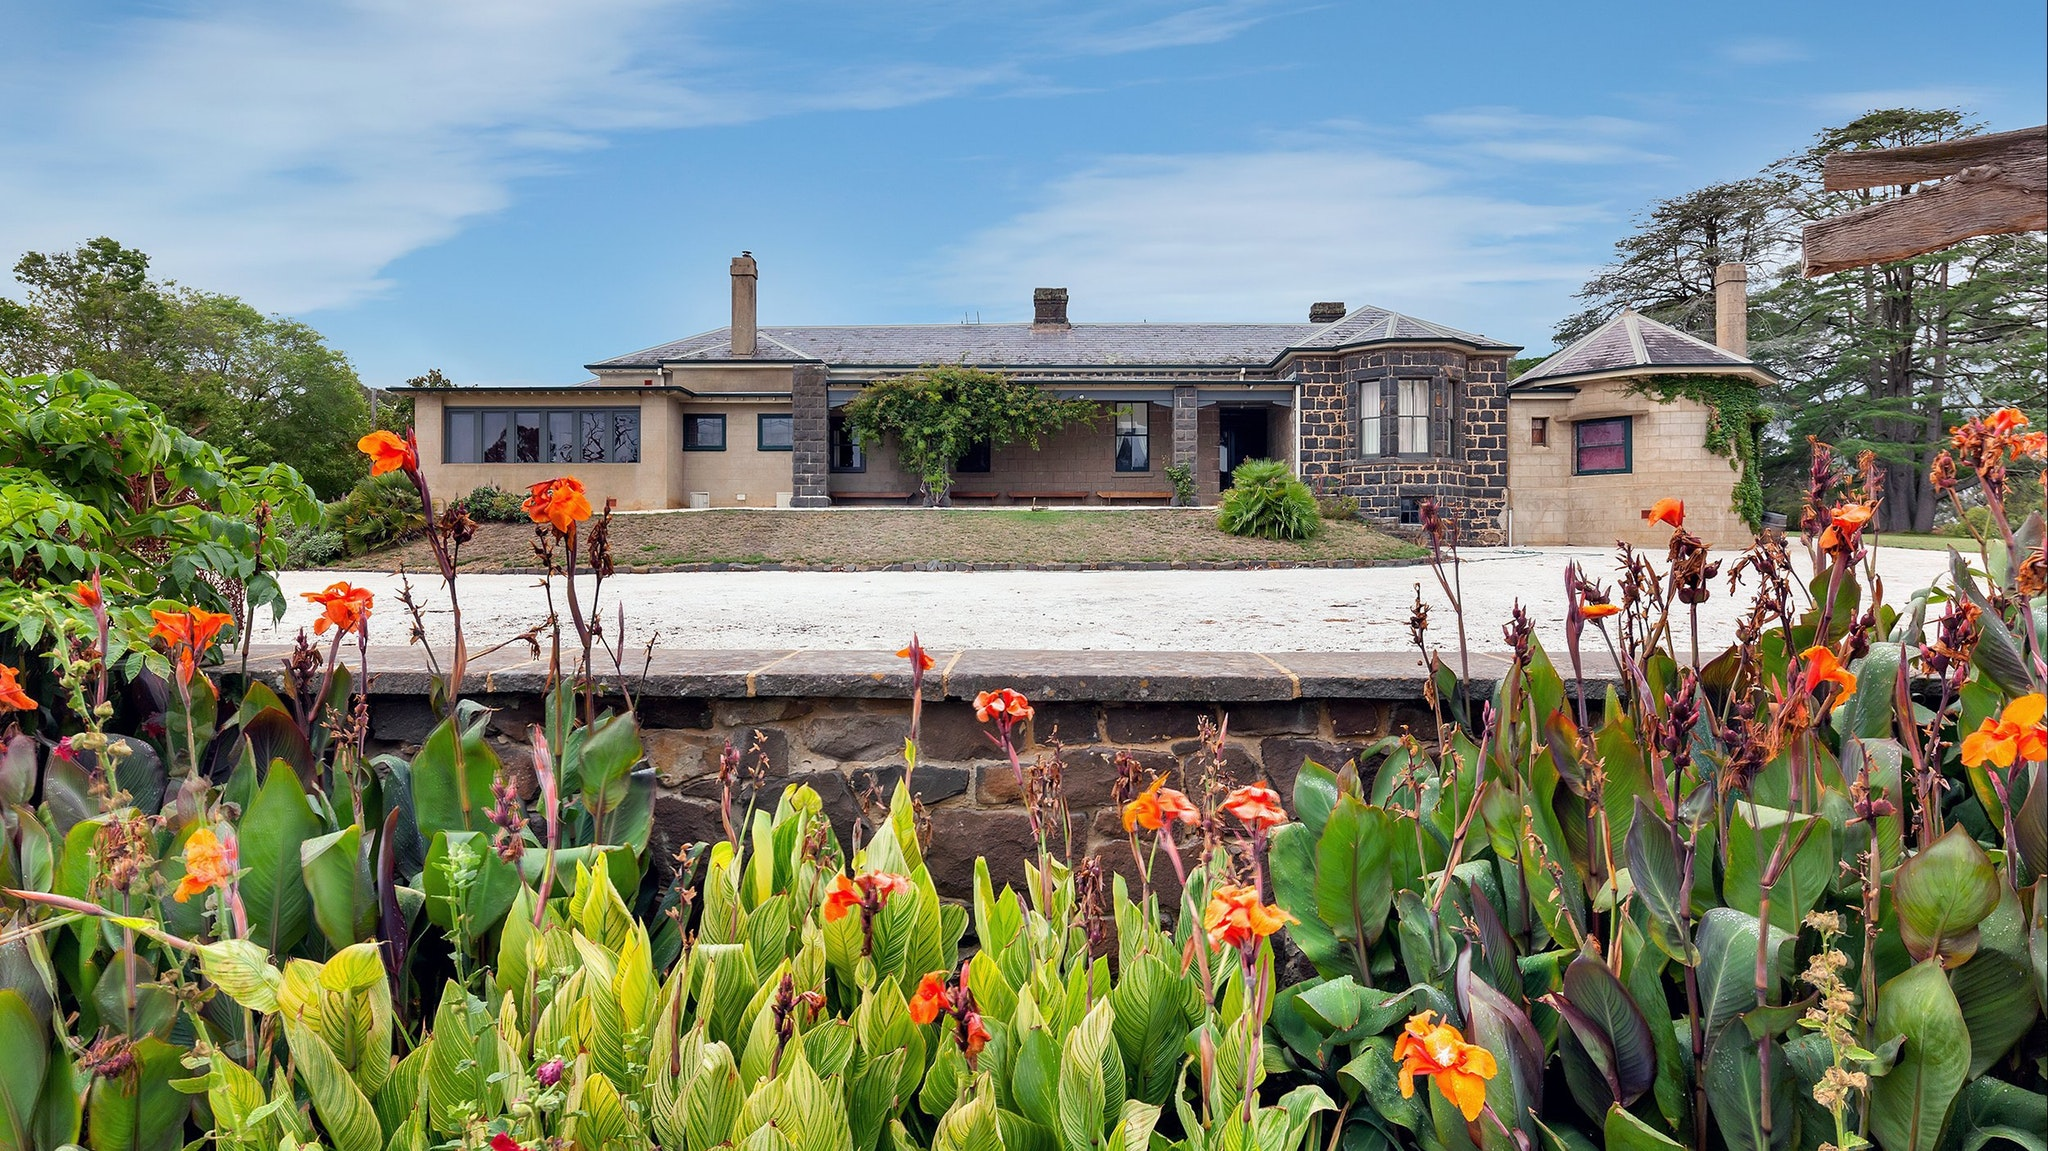 Eurambeen Historic Homestead and Gardens